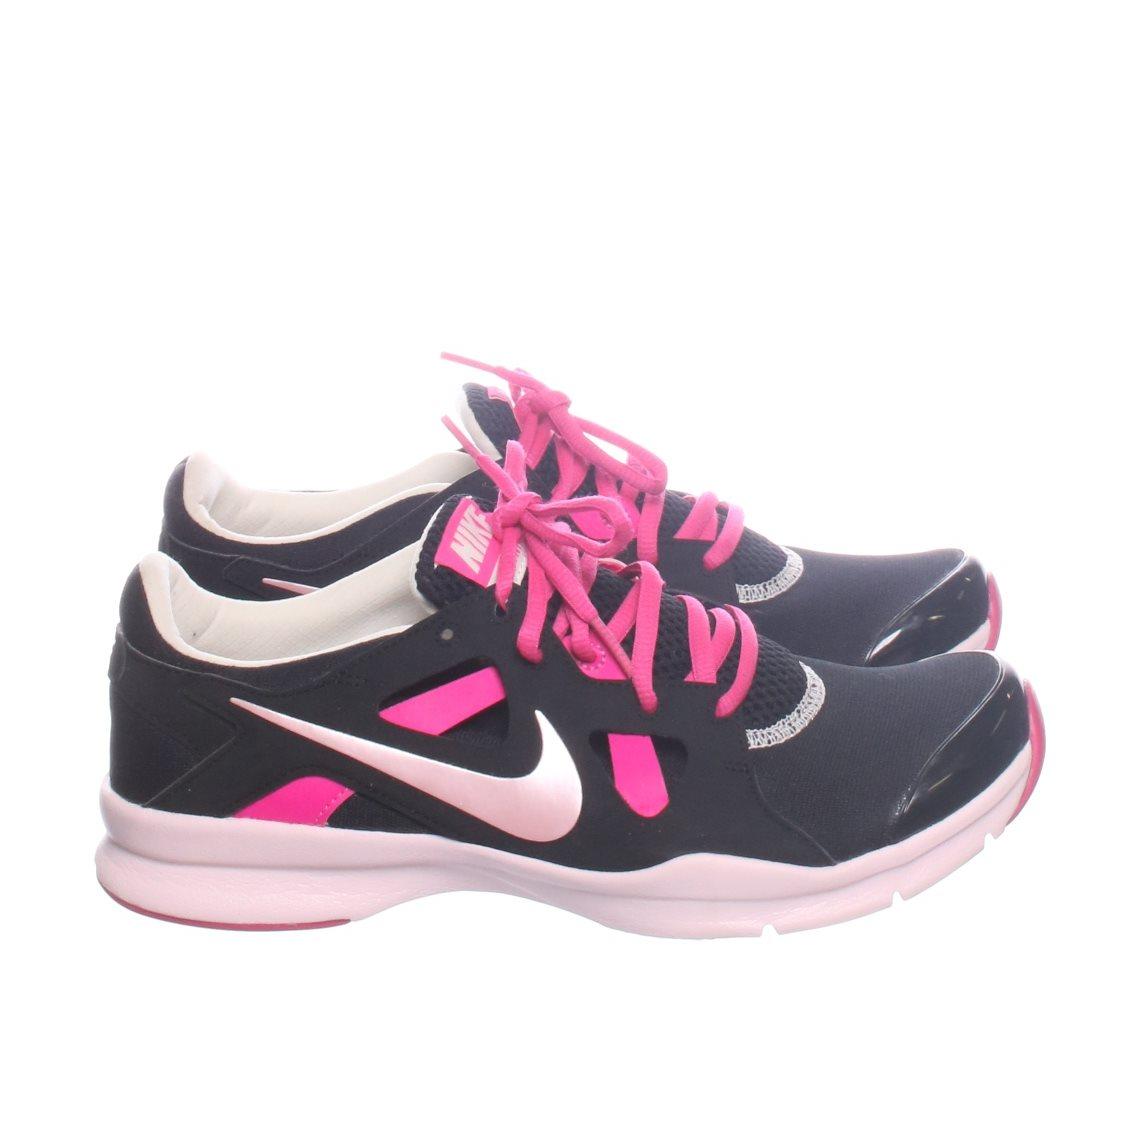 watch 6c177 2ec65 Nike, Träningsskor, Strl  40.5, Svart Rosa